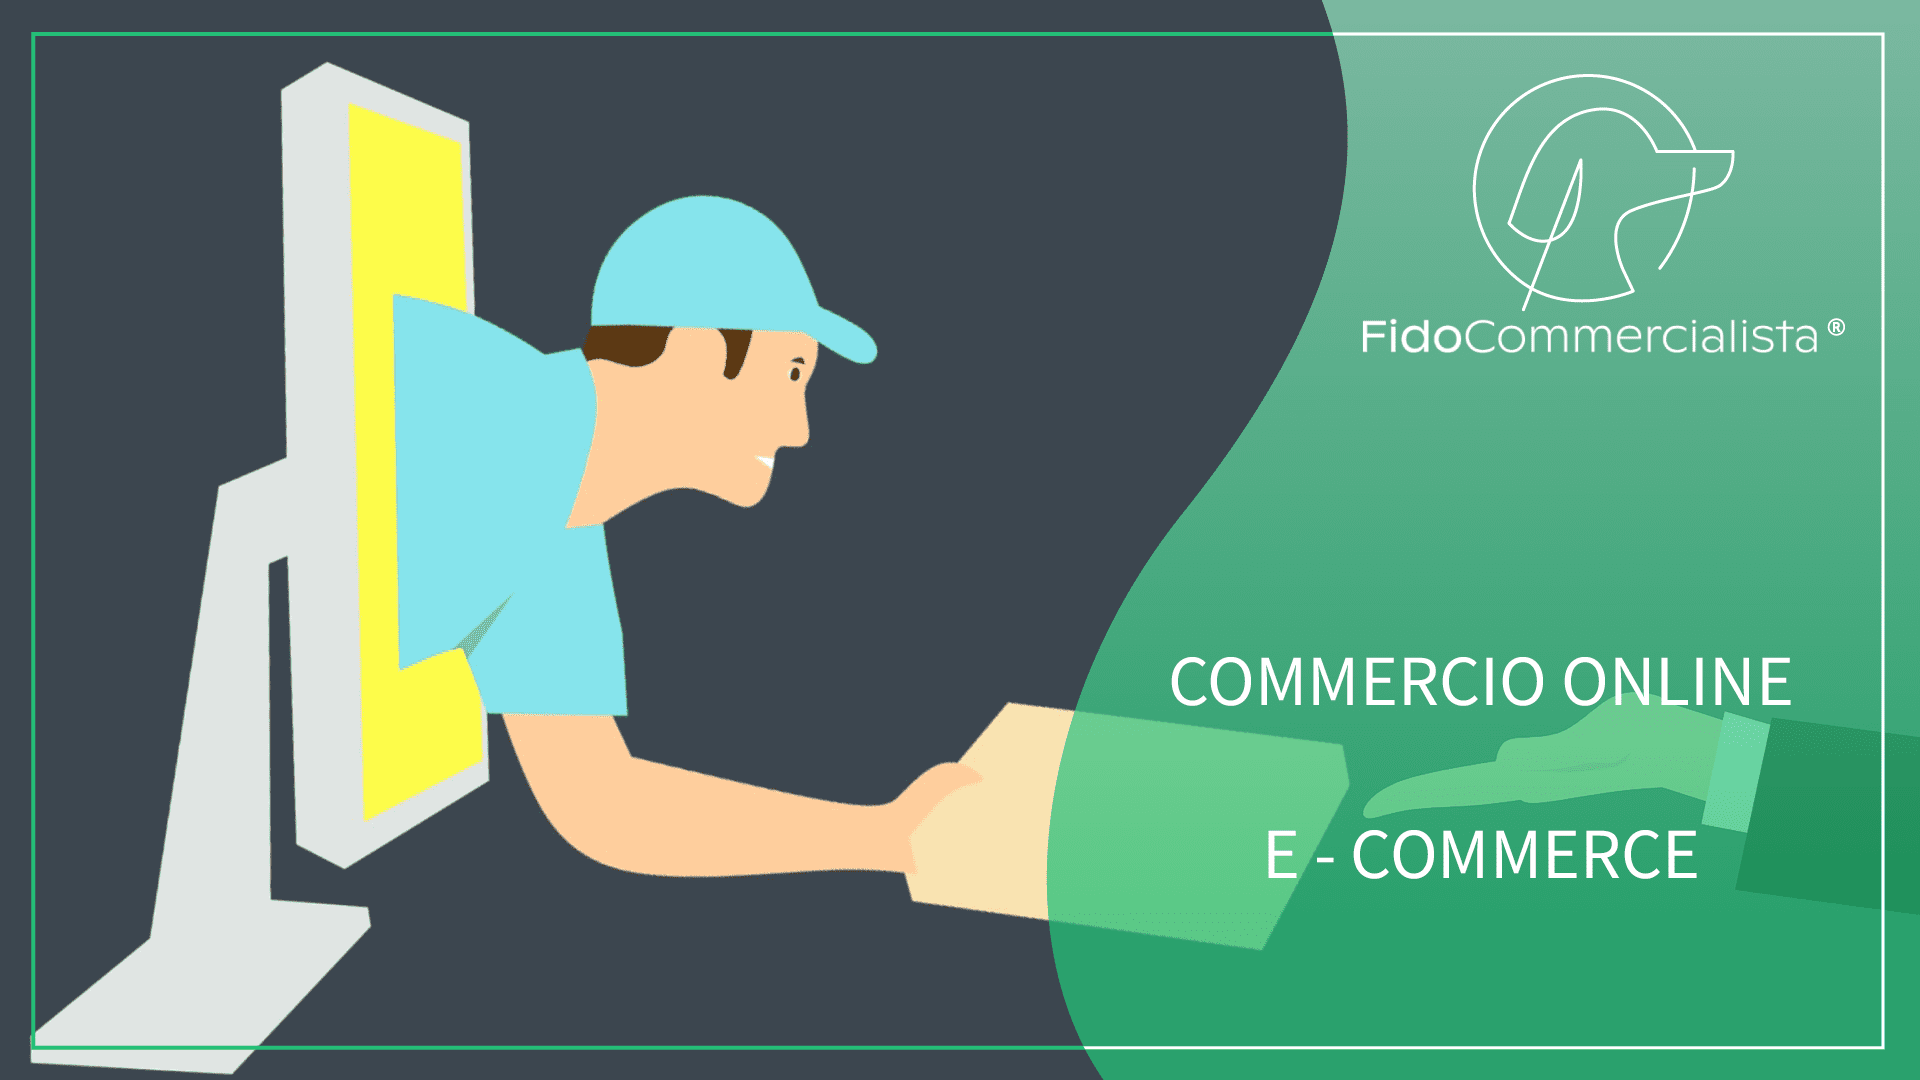 E-Commerce – Commercio Online -Dropshipping